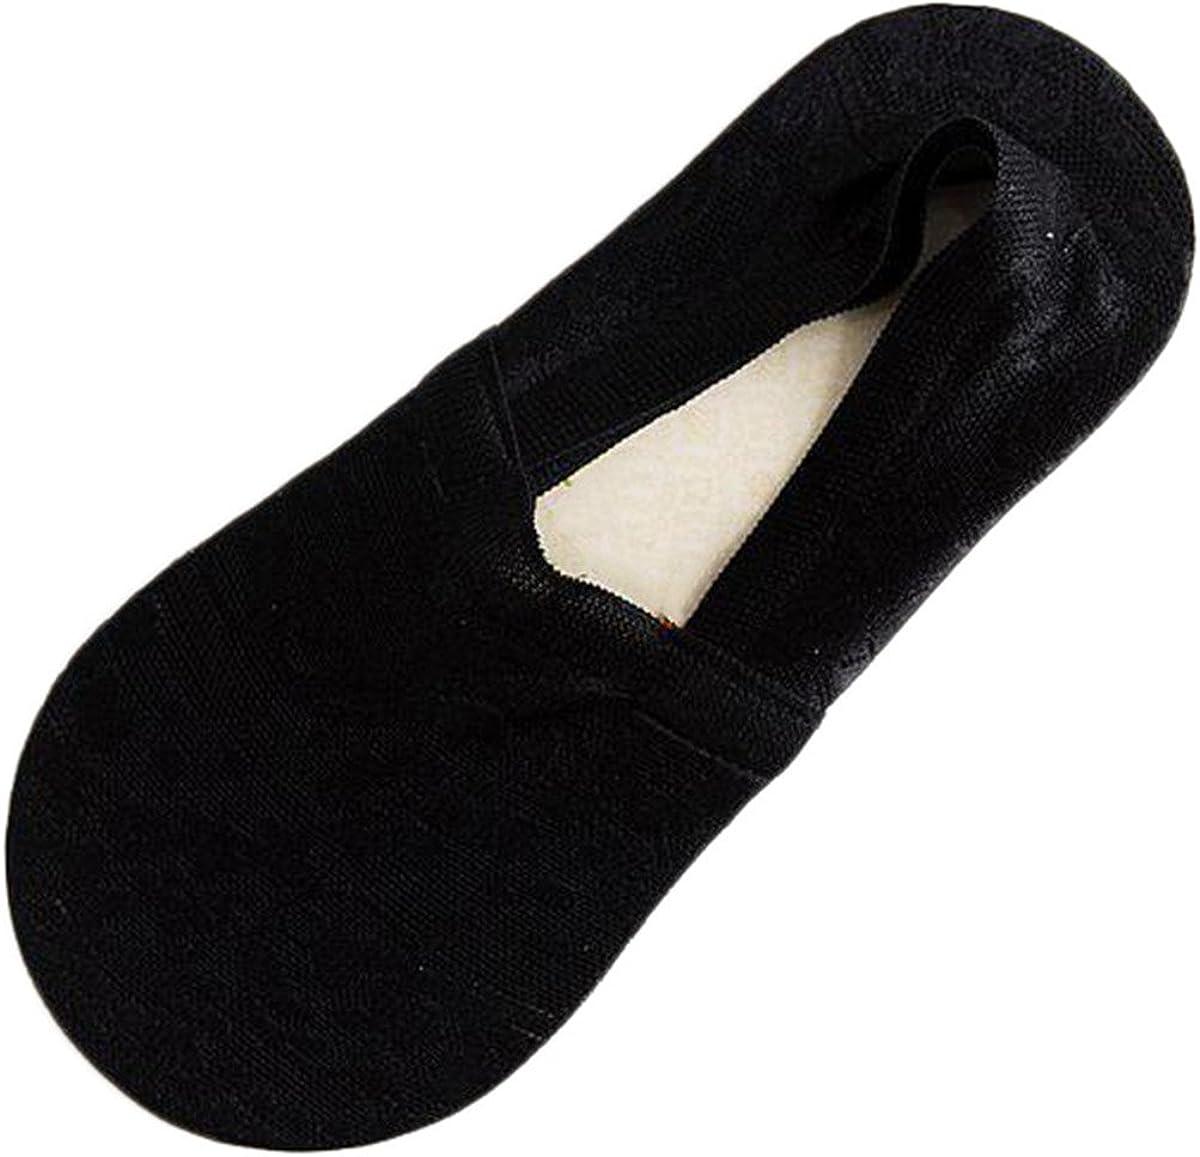 5 Pair Women's No Show Lace Socks For Flats Non-Skid Hidden Boat Socks